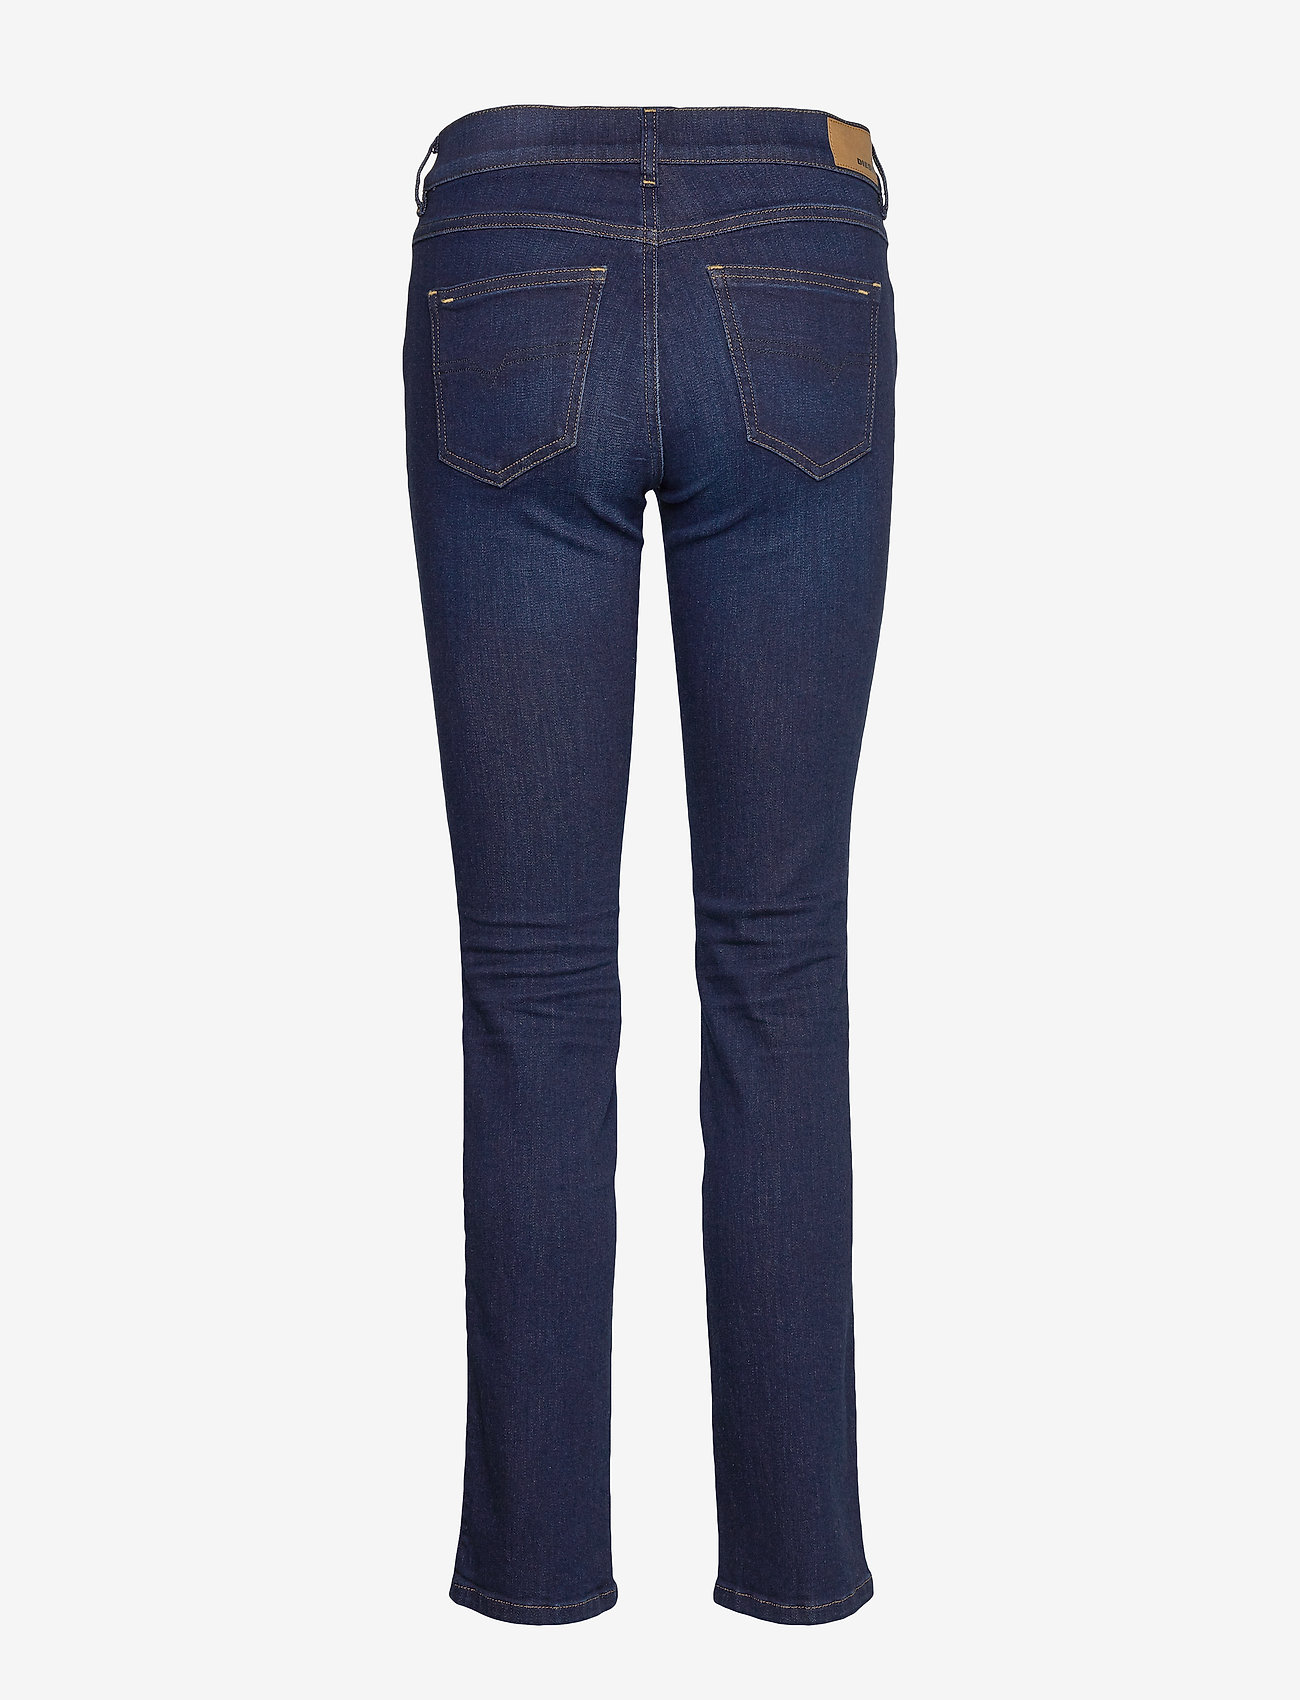 Diesel Women - D-SANDY L.32 TROUSERS - slim jeans - denim - 1